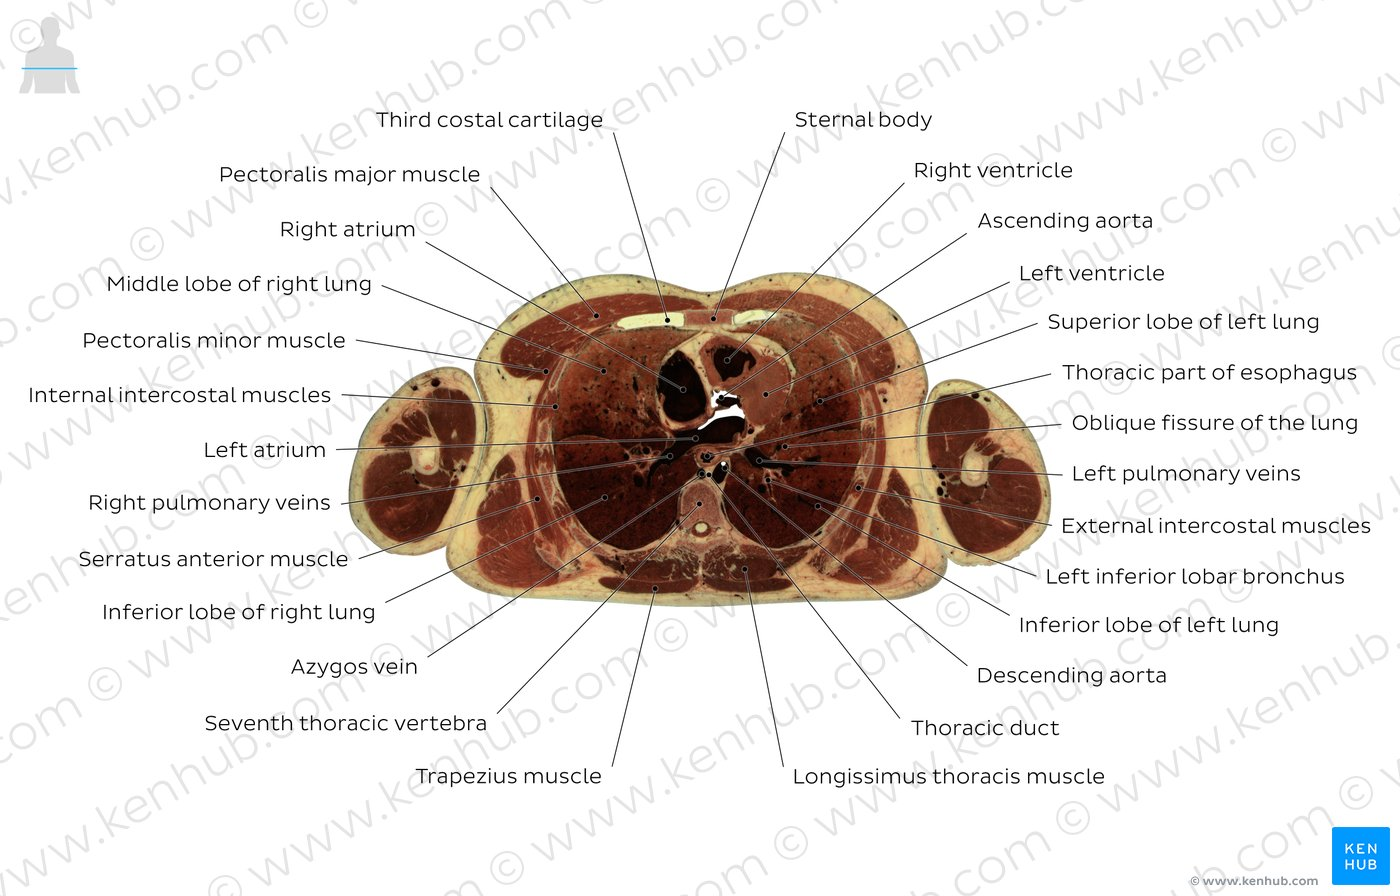 billroth 1 diagram 2004 gmc yukon bose radio wiring enchanting thoracic vertebra pattern physiology of human